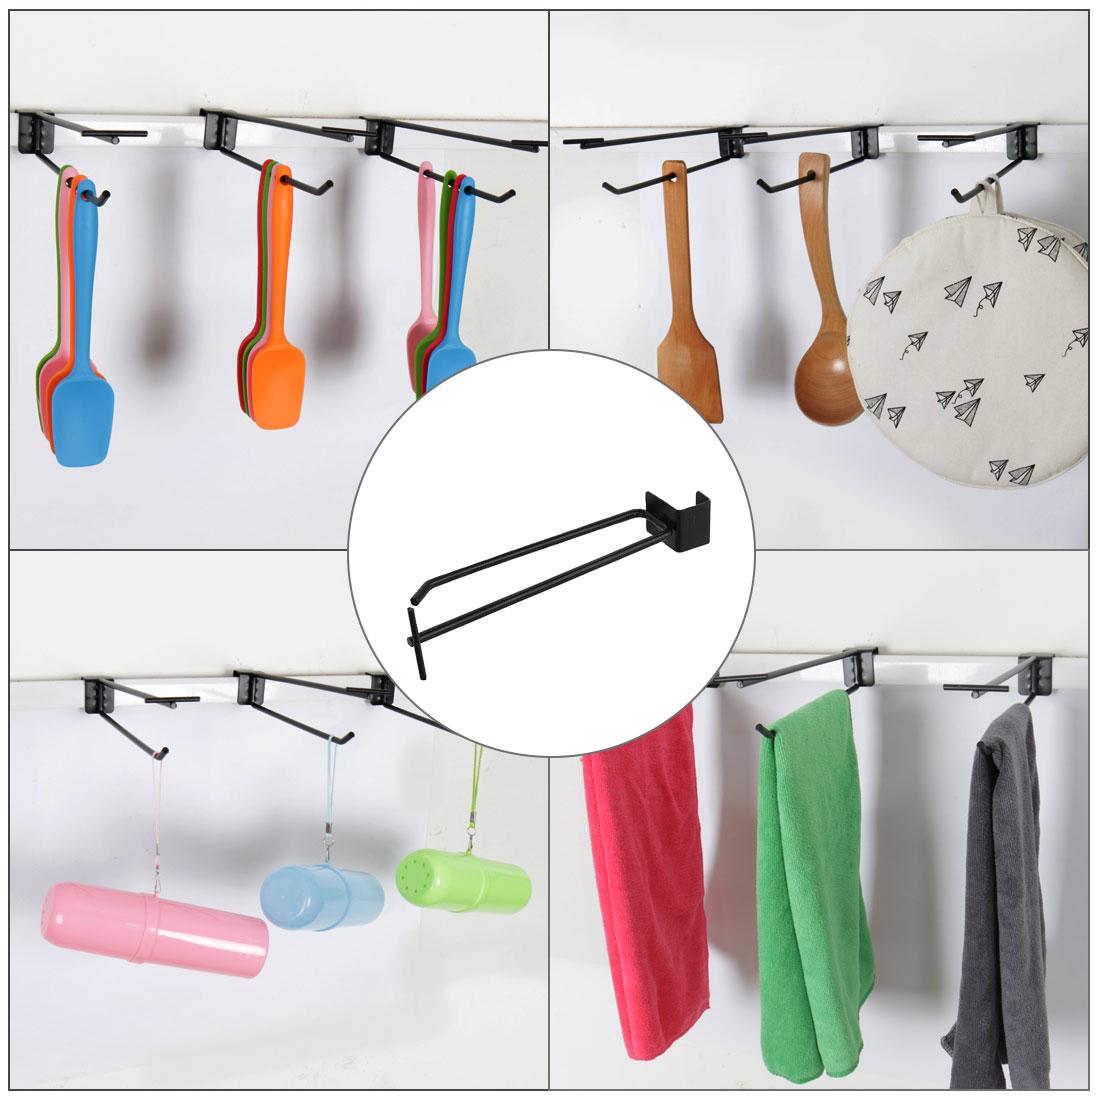 Slat-Wall-Flip-Scan-Hooks-9-1-034-Length-Metal-for-Shop-Retail-Display-Organizer thumbnail 9